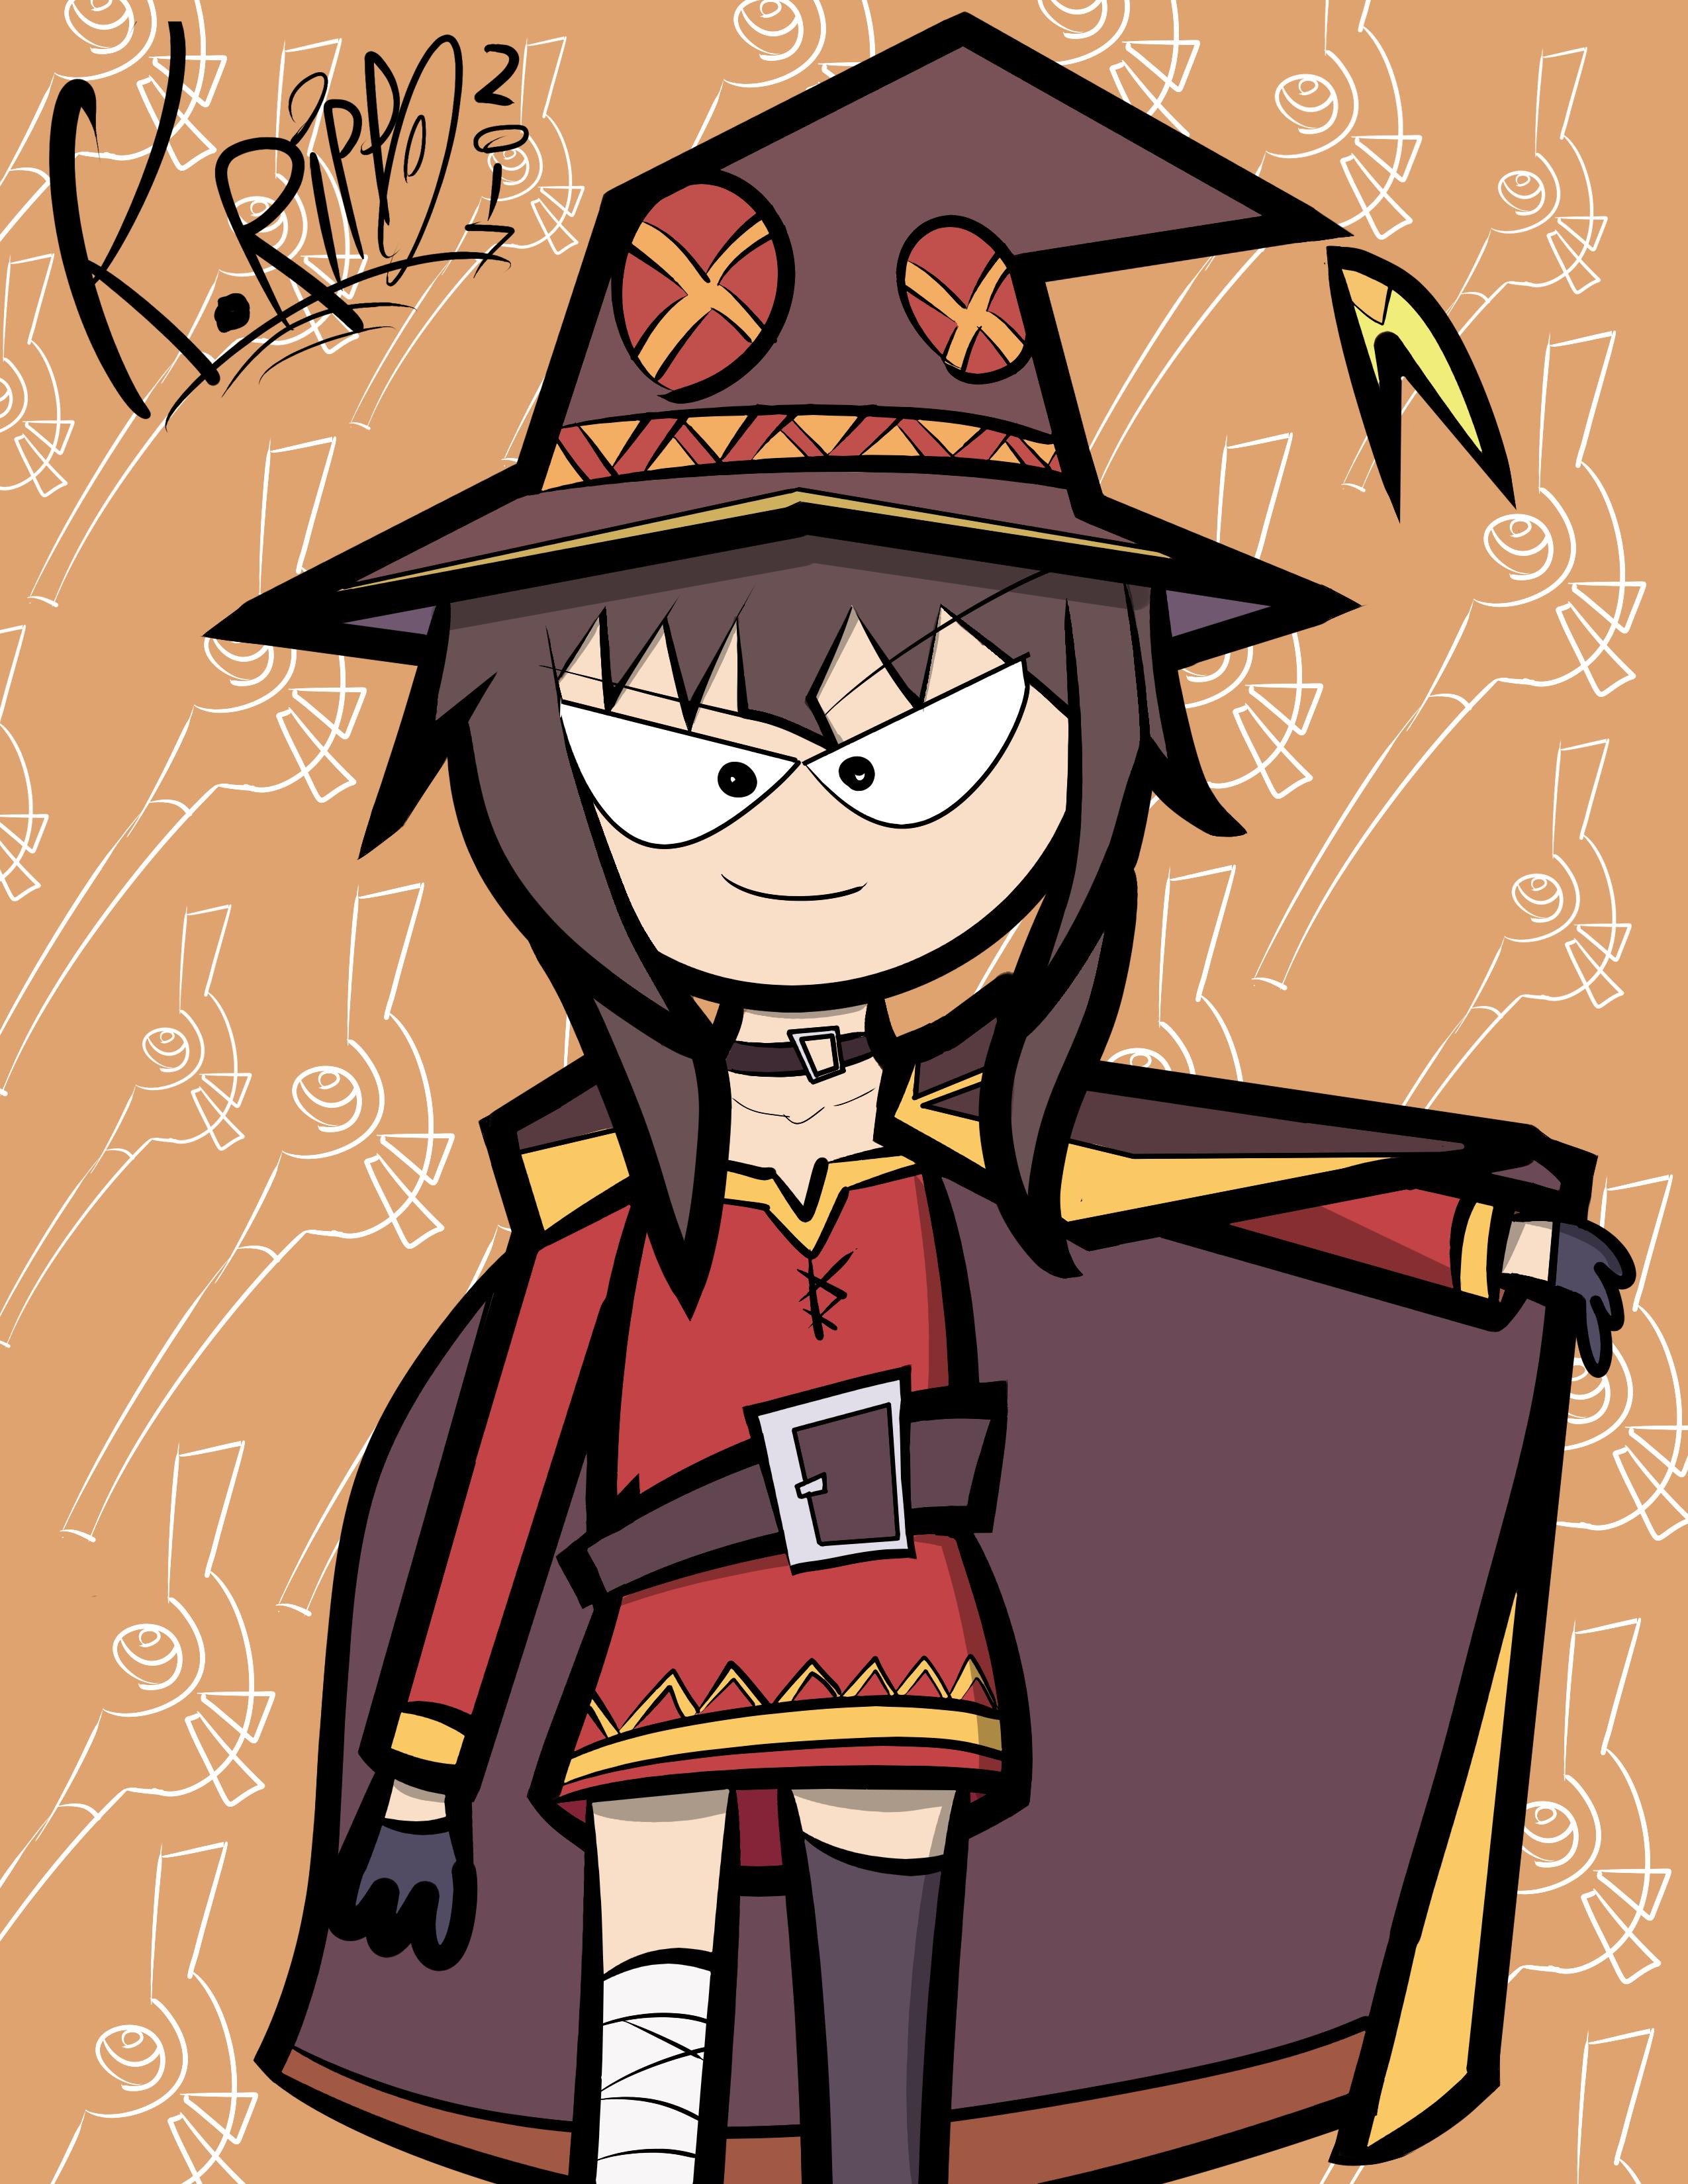 Megumin from Konosuba